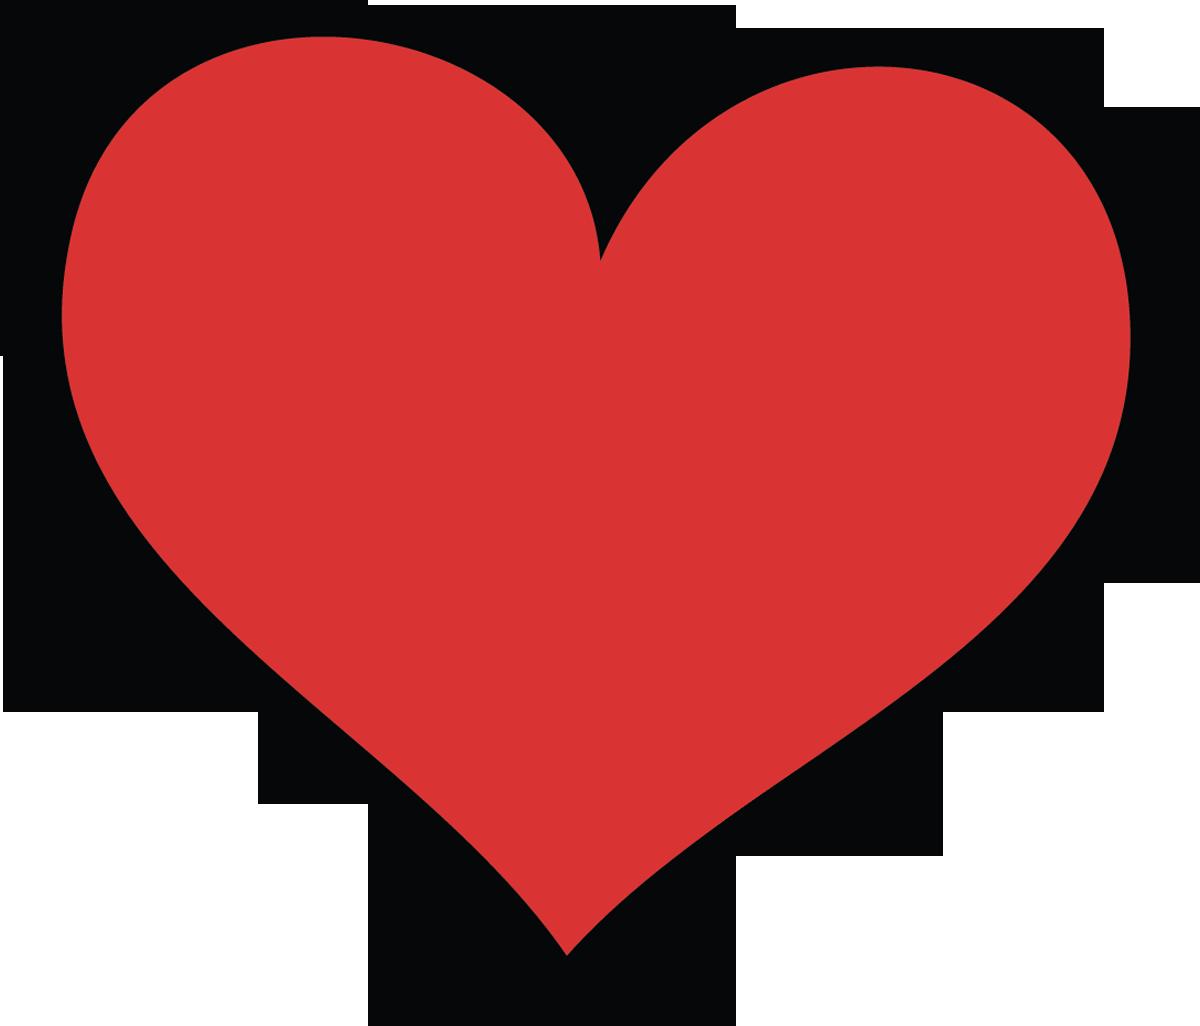 clipart love heart-clipart love heart-13